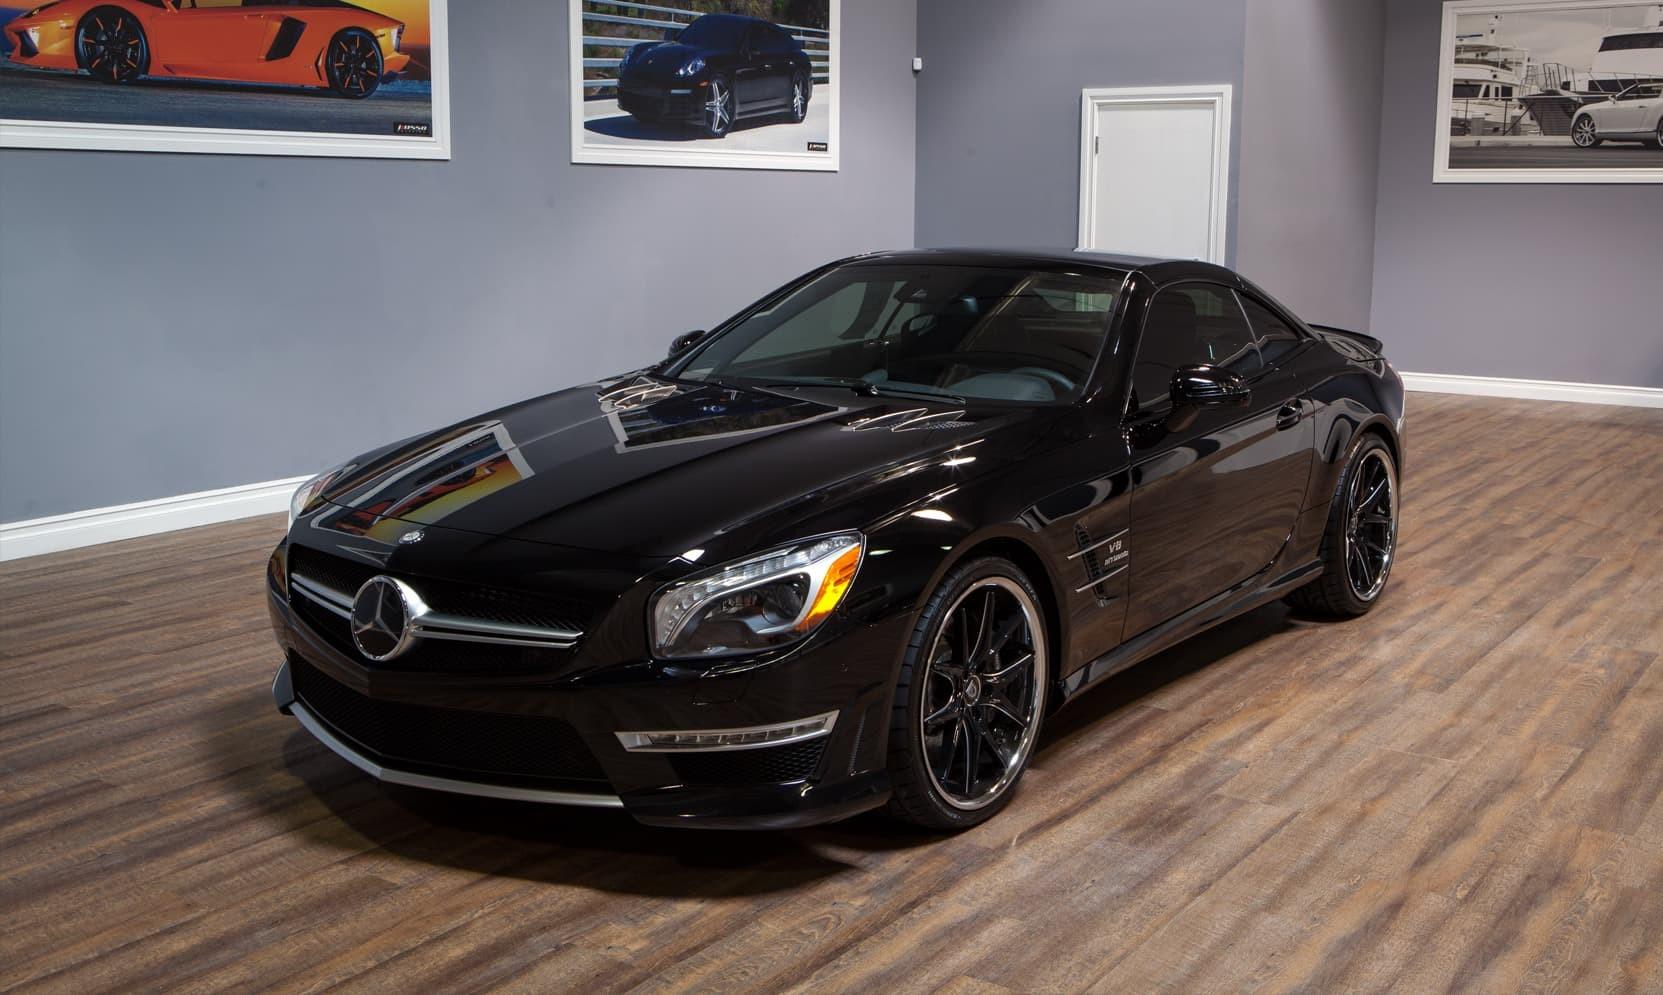 Machine and black R-Twelve on the Mercedes SL63.